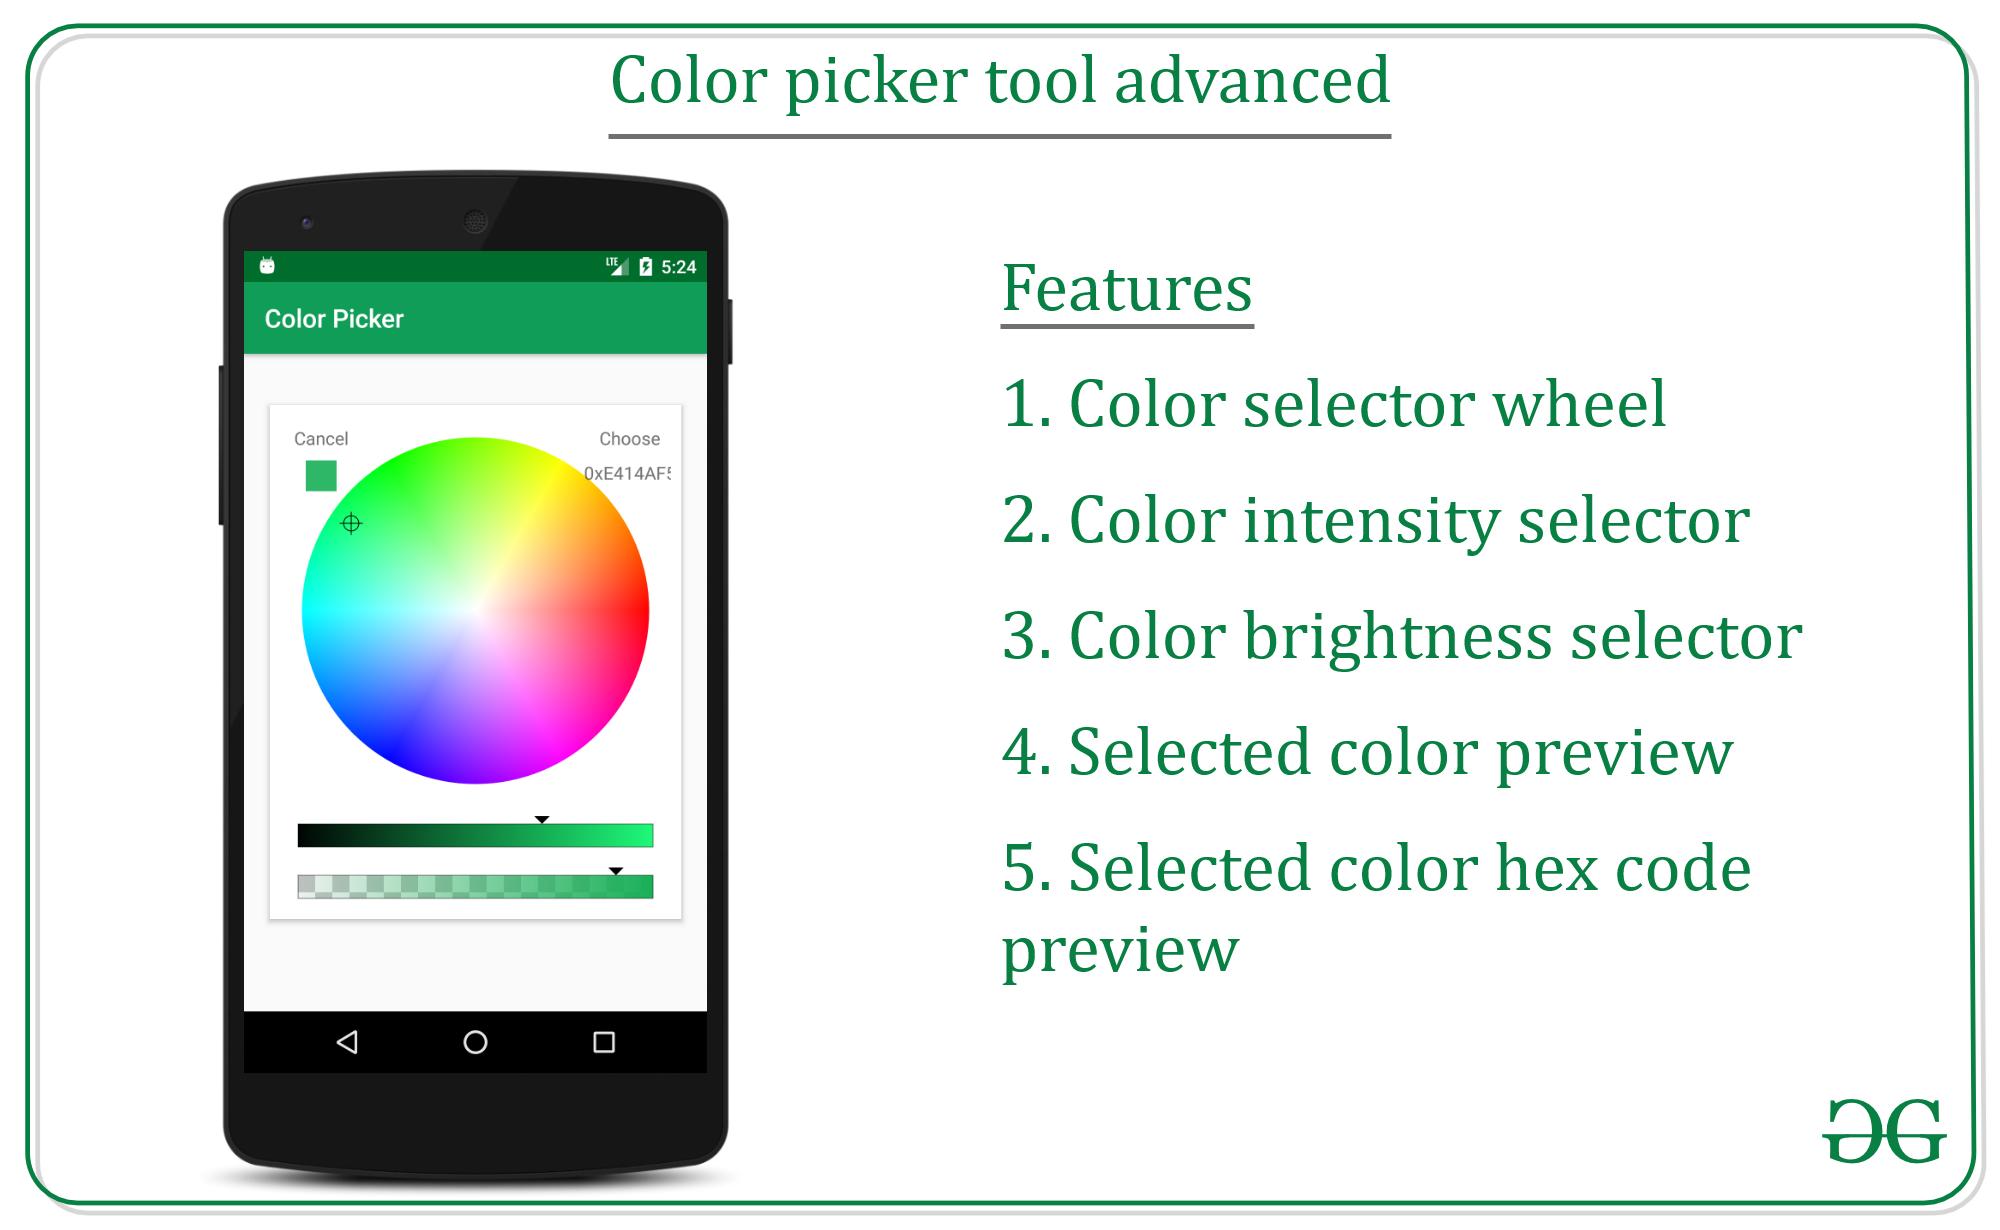 Color picker tool advanced